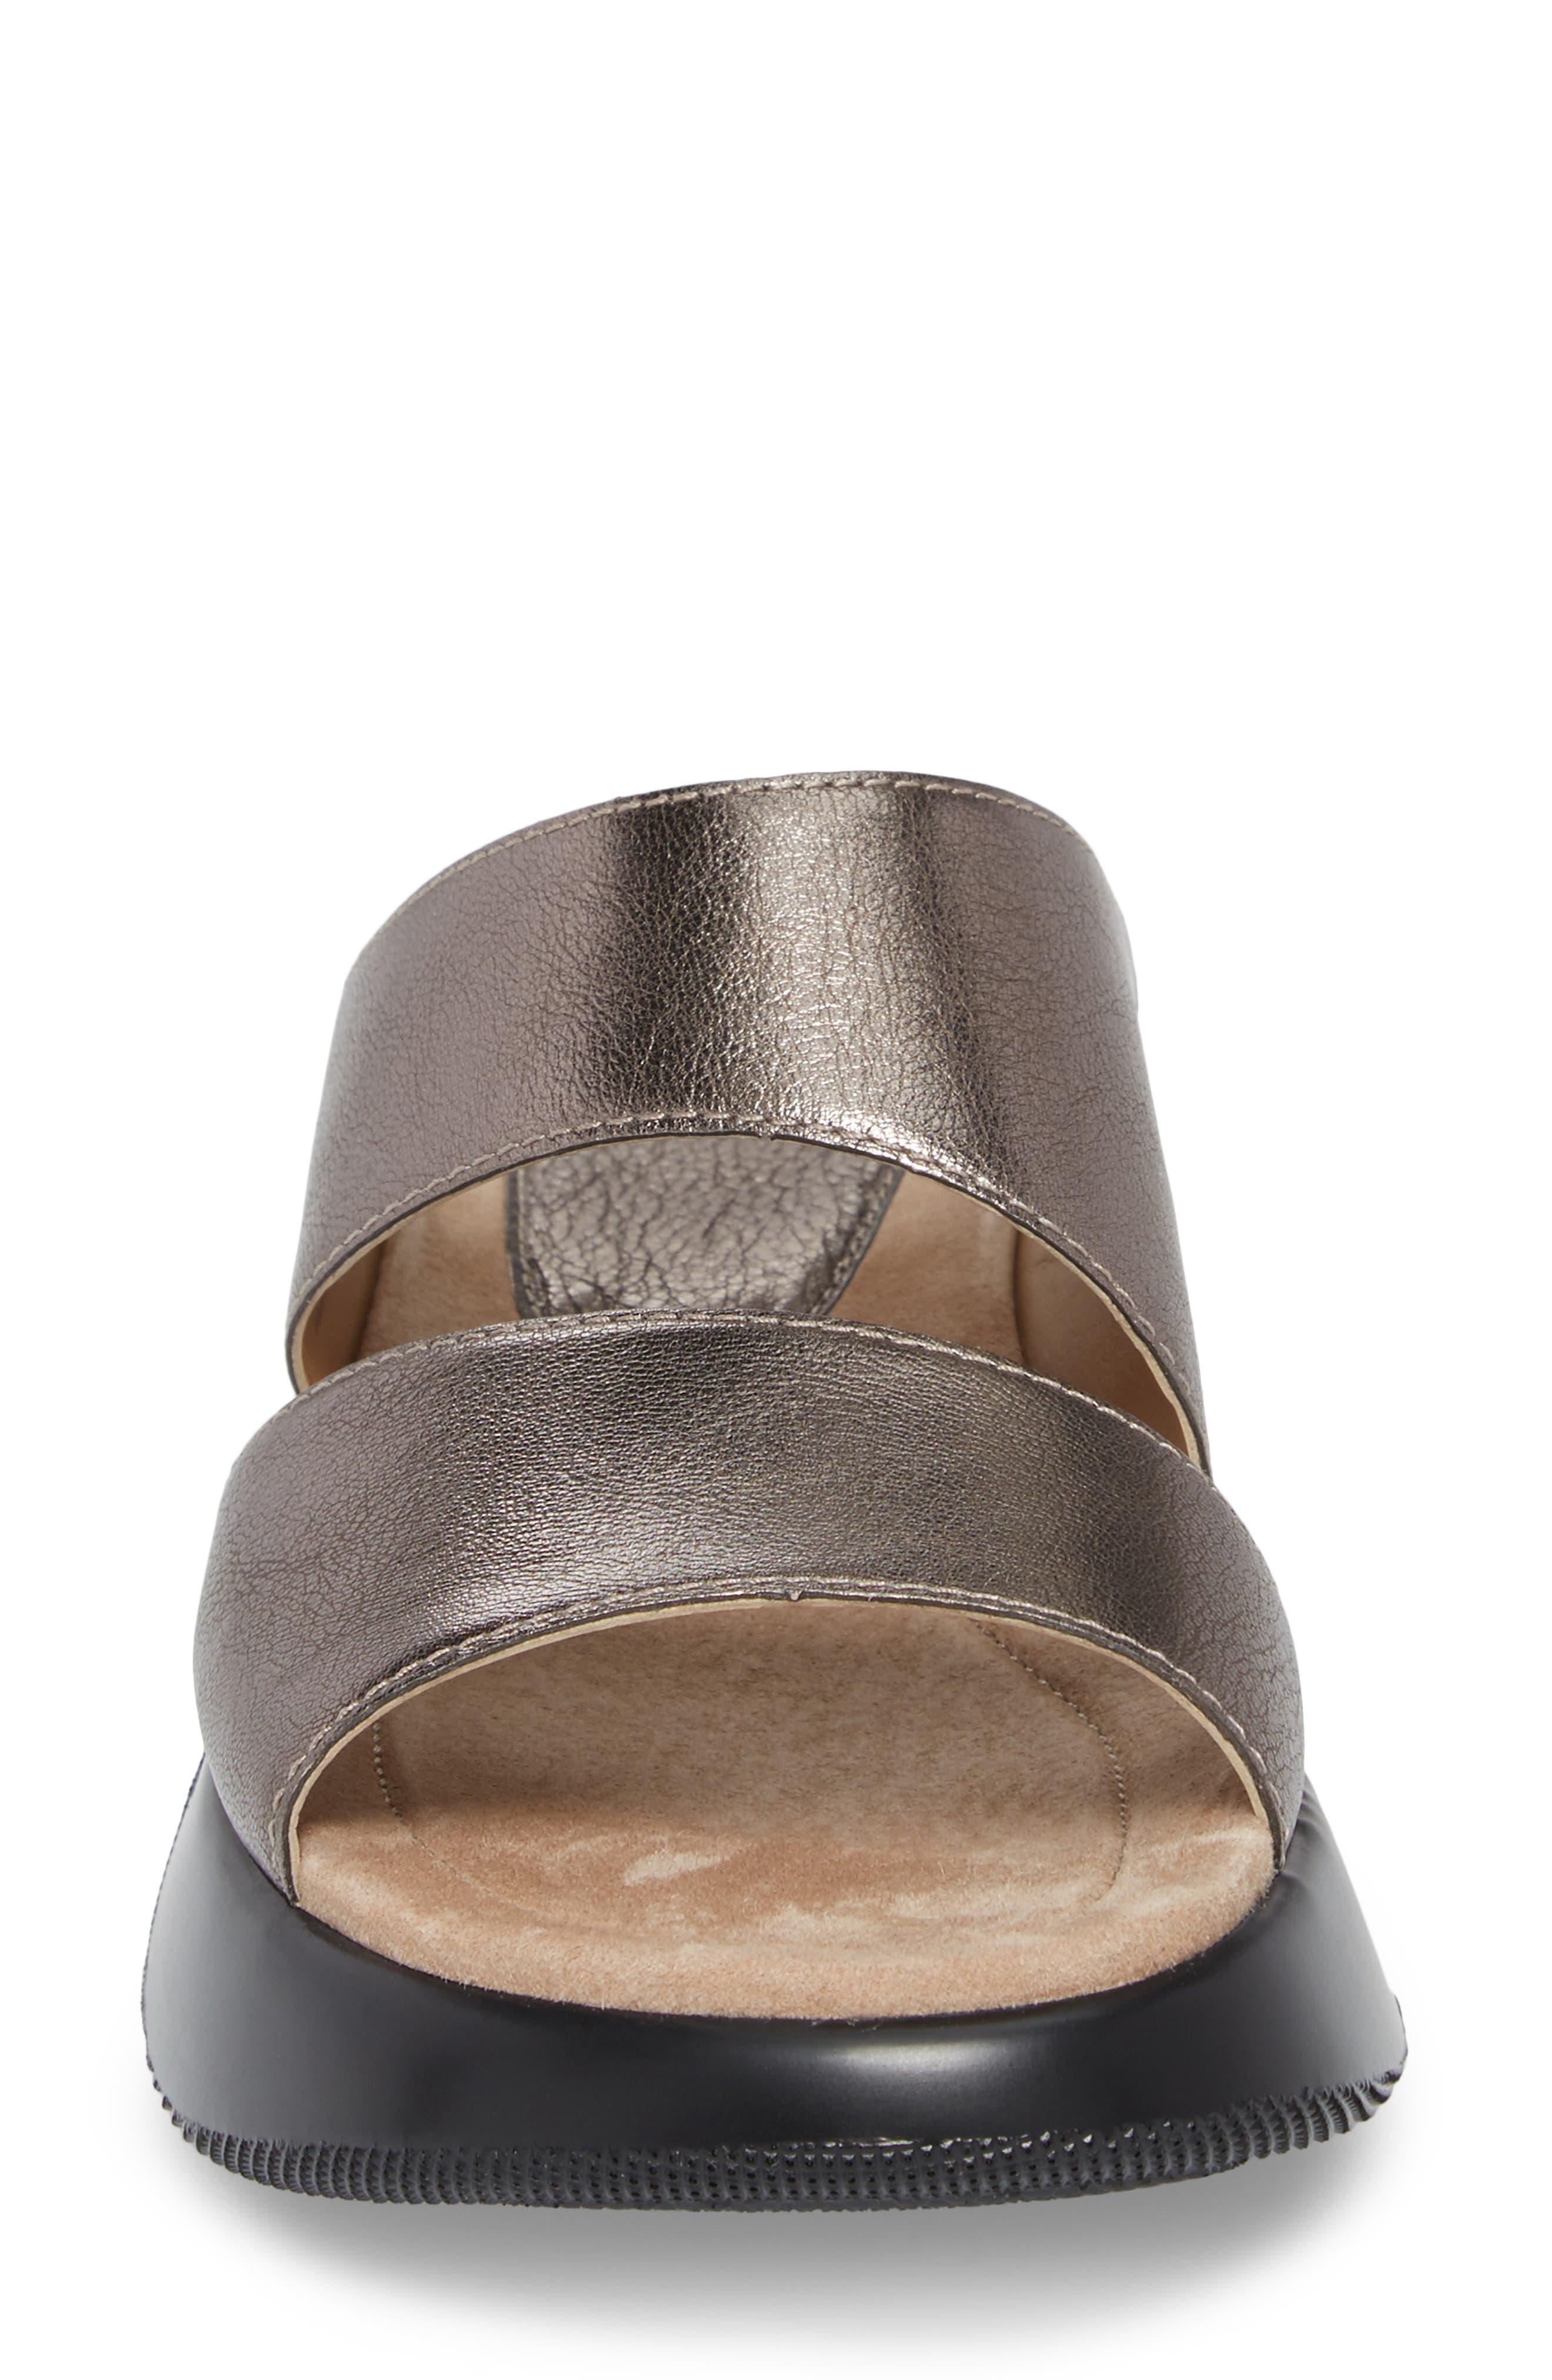 Lana Slide Sandal,                             Alternate thumbnail 4, color,                             Pewter Leather